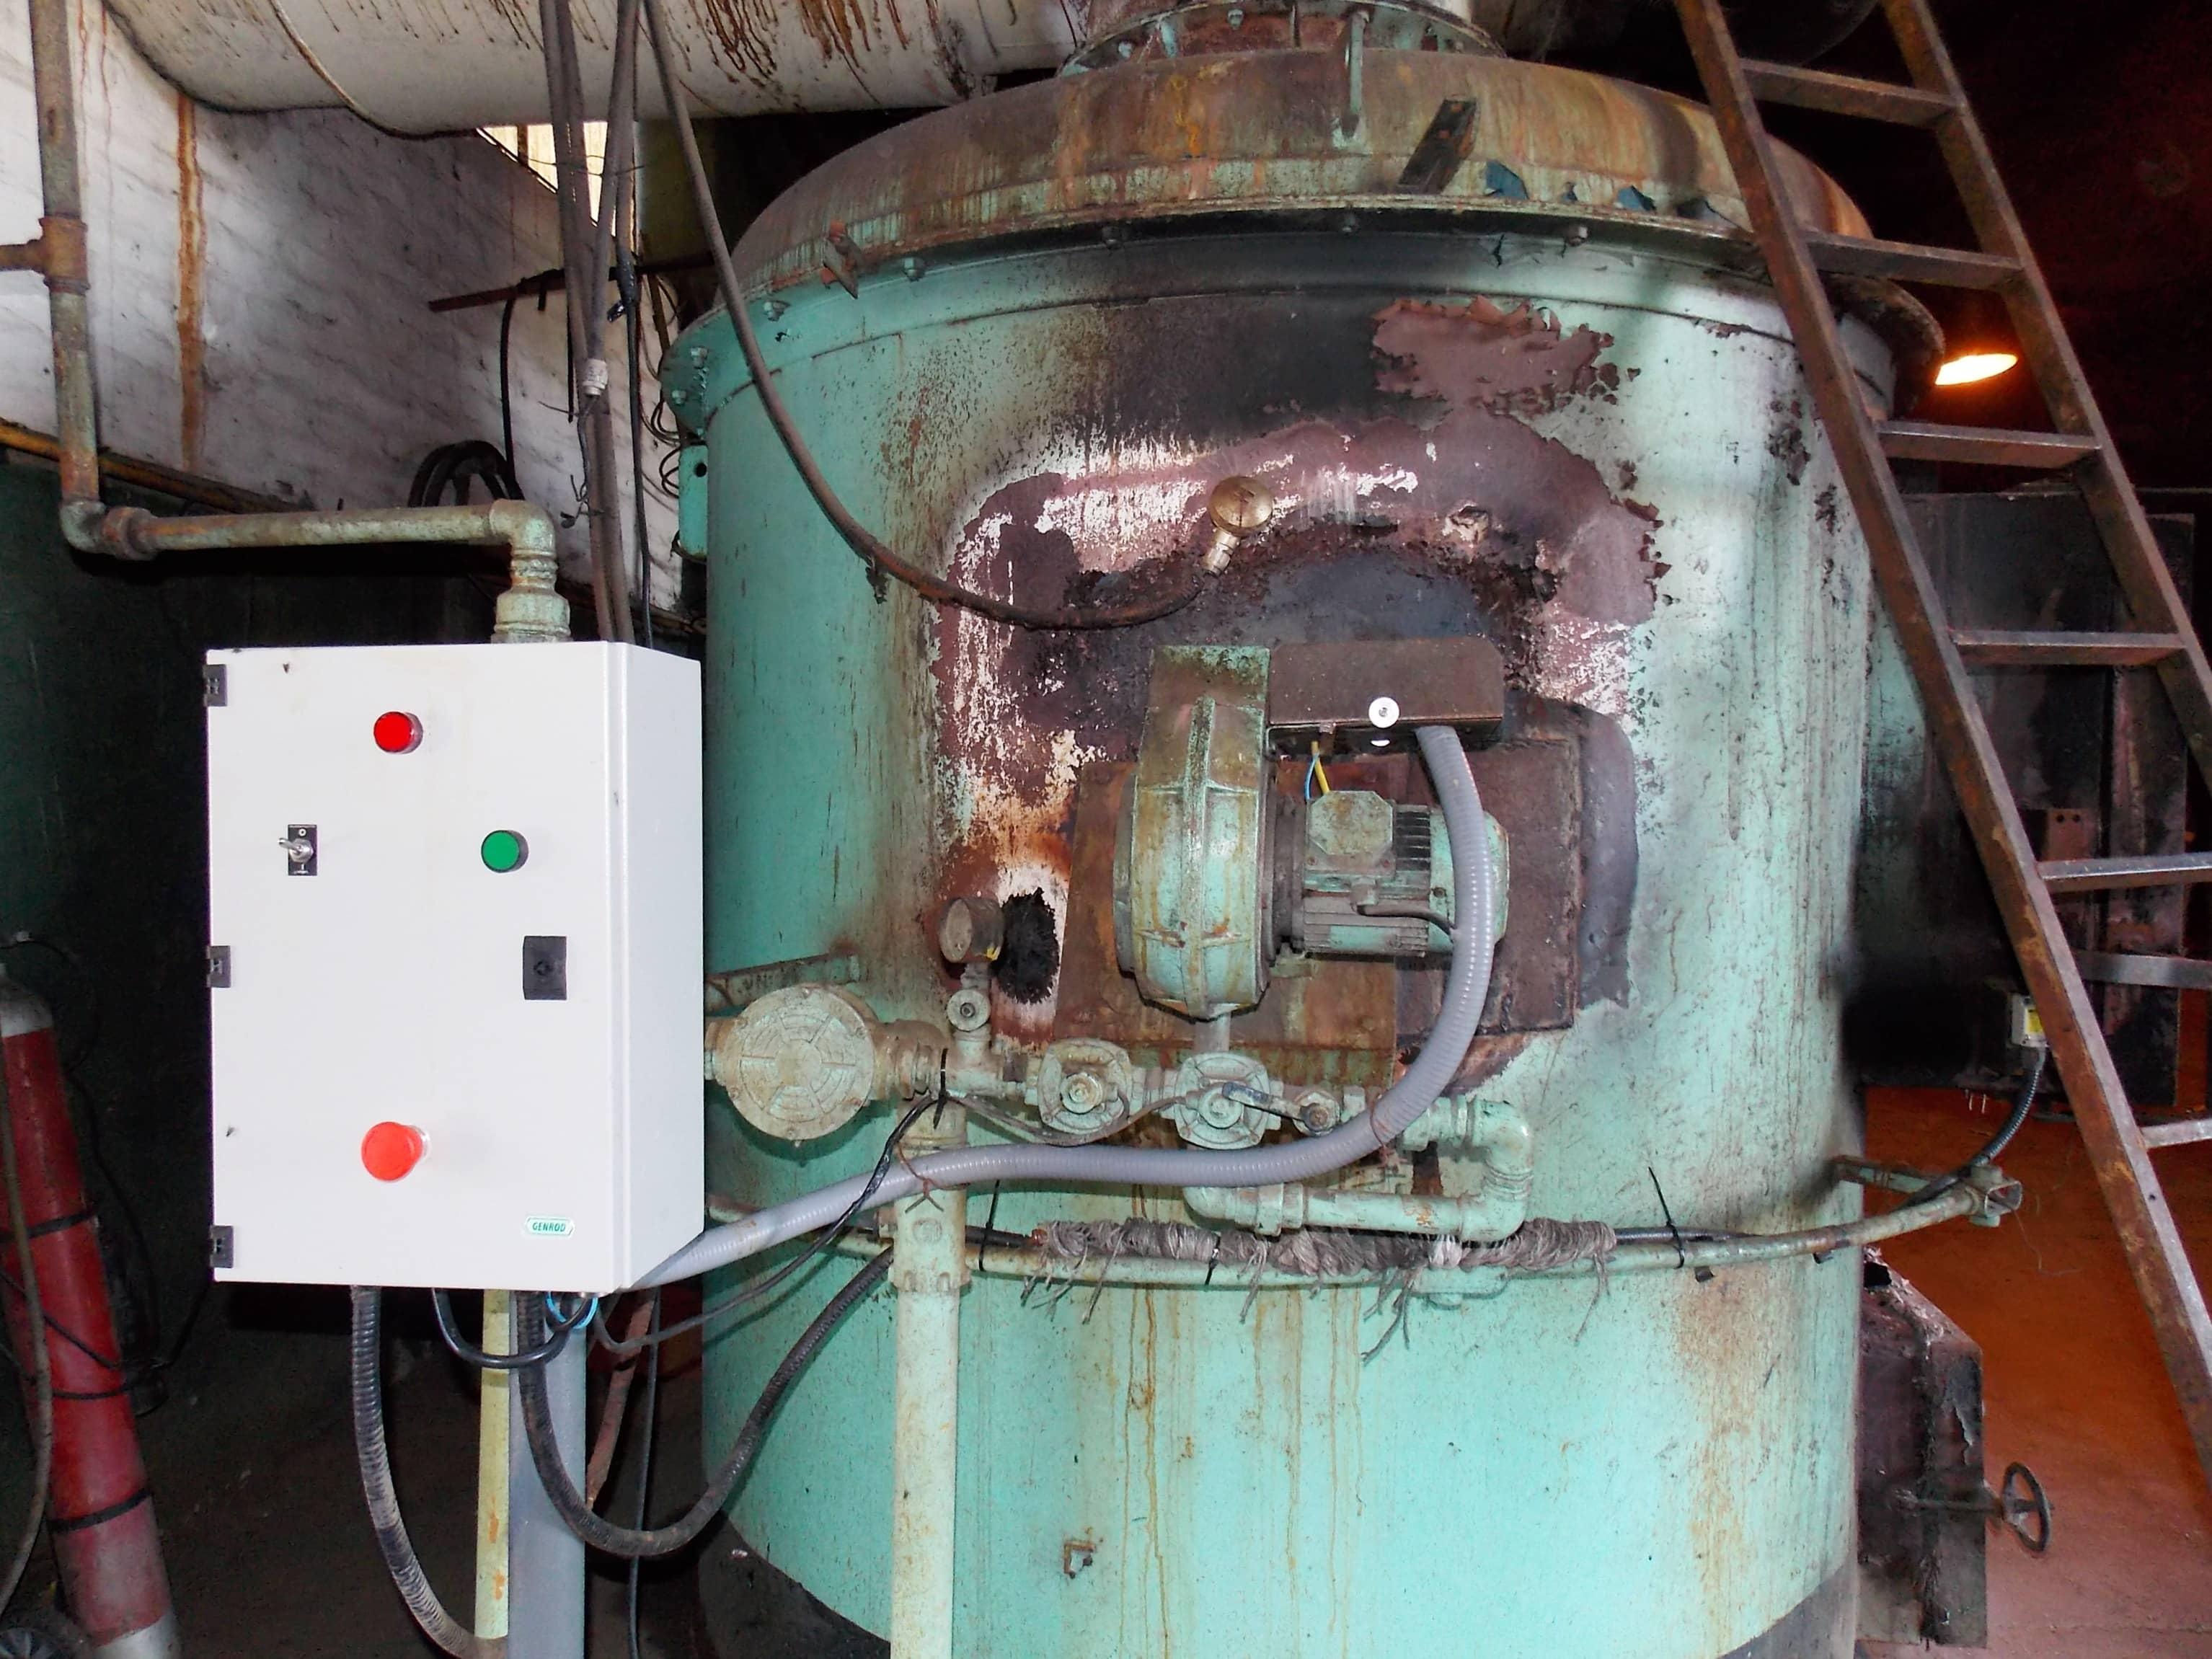 Reparación de un horno pirolítico